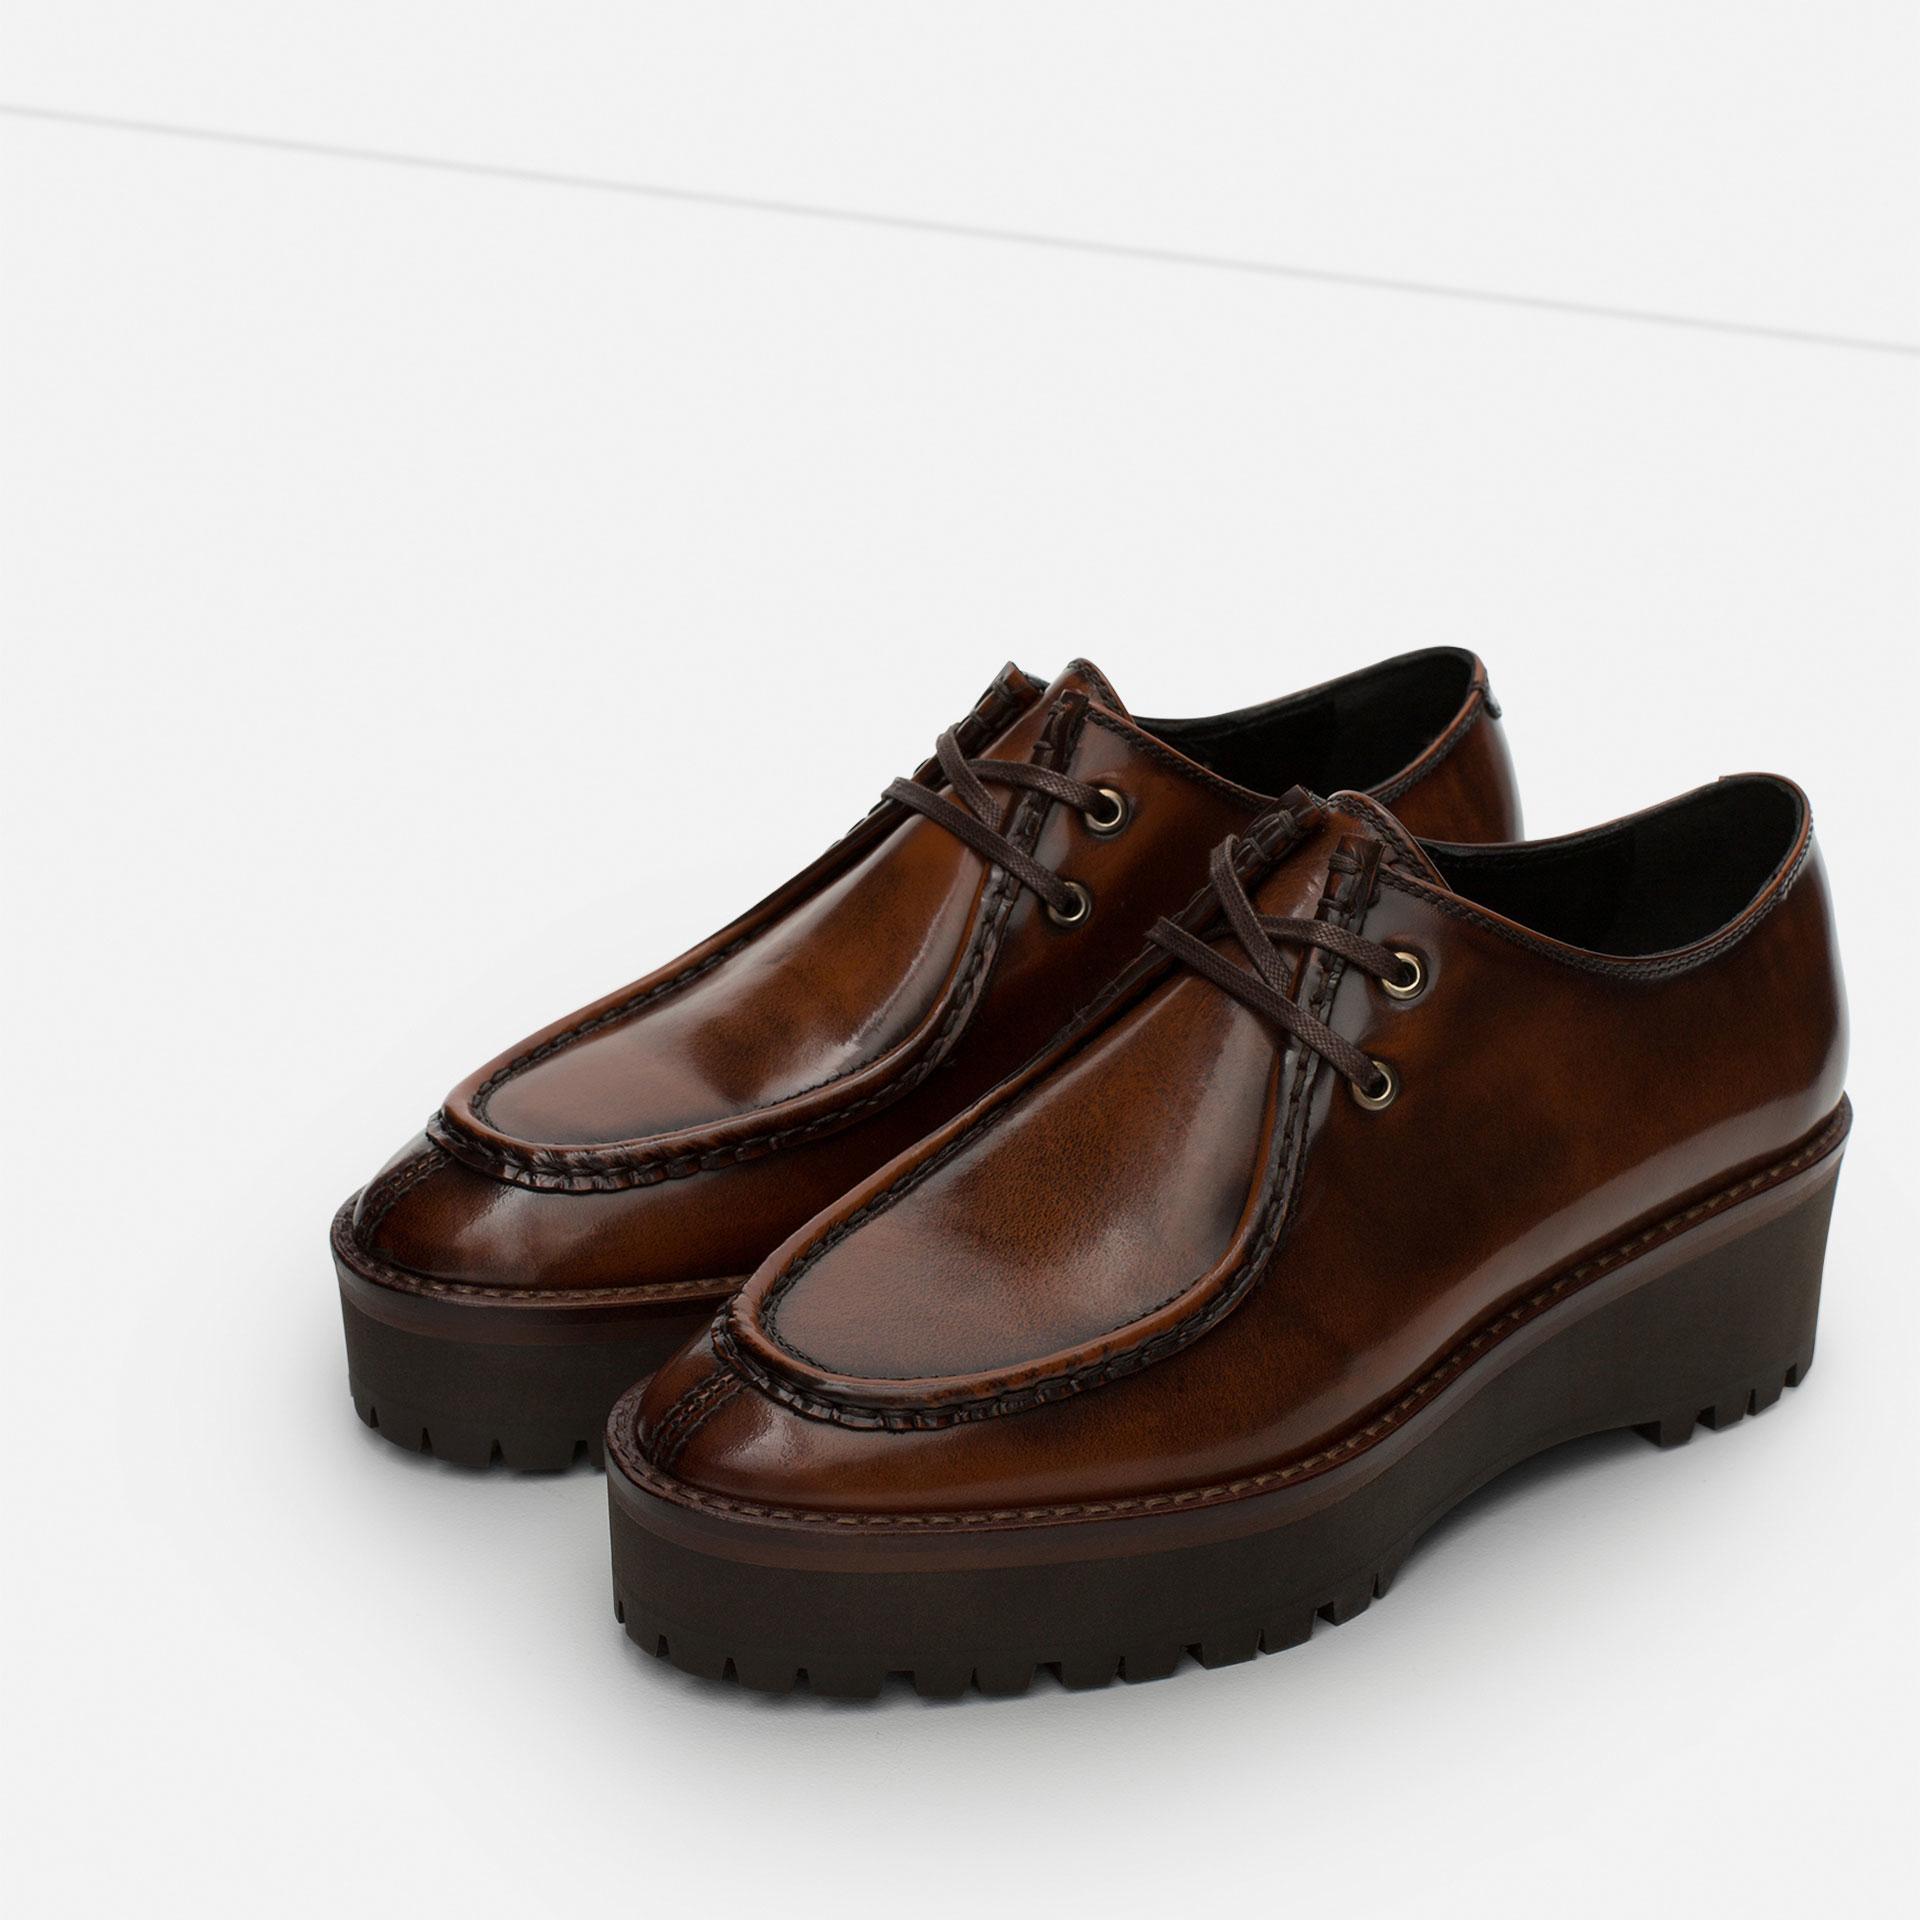 Flat Platform Heels